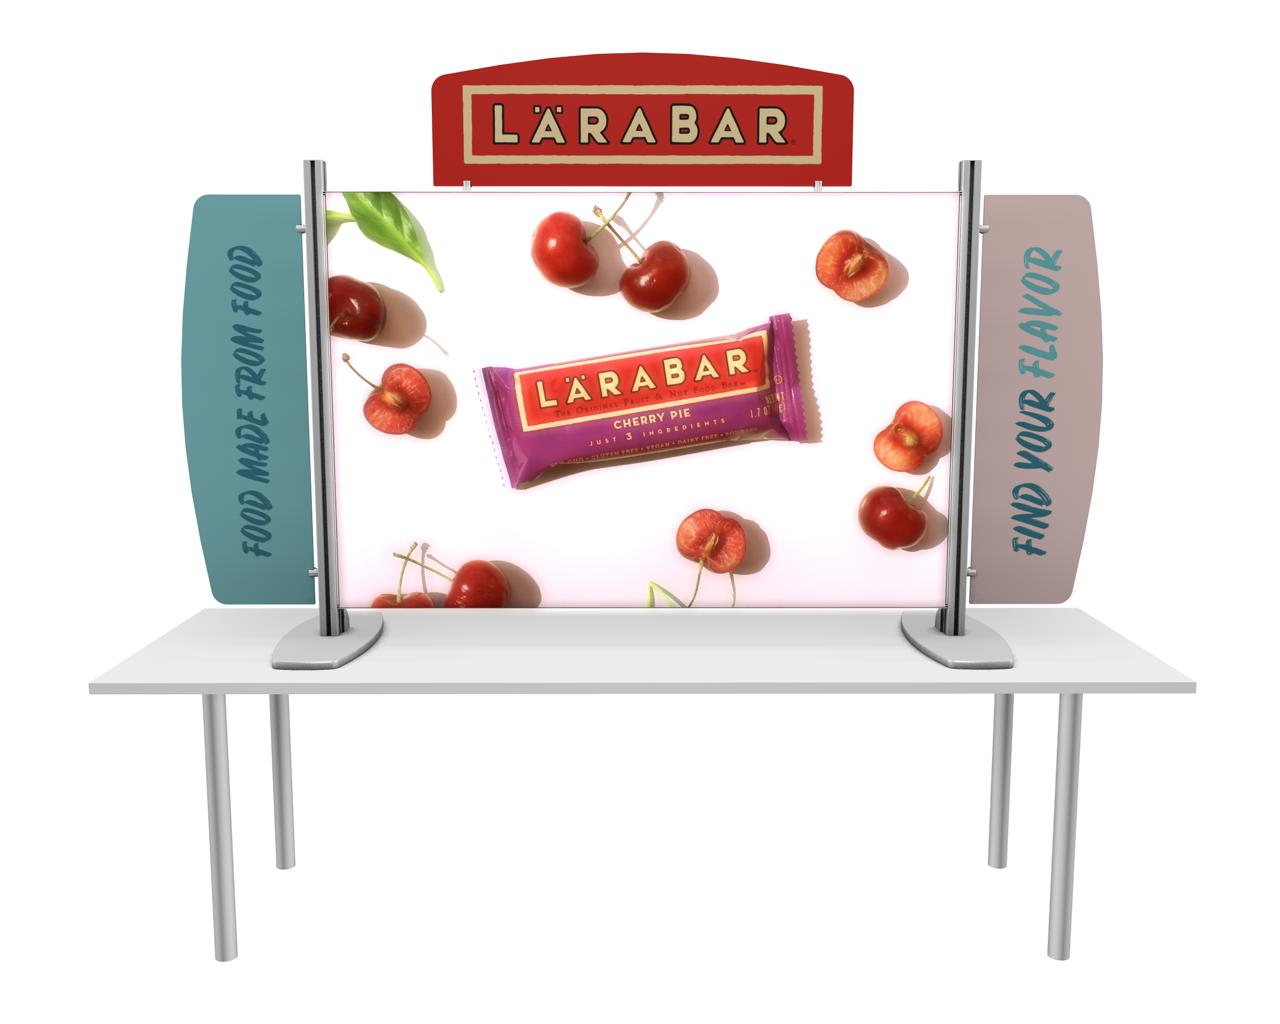 Exhibitline Backlit Tabletop Display